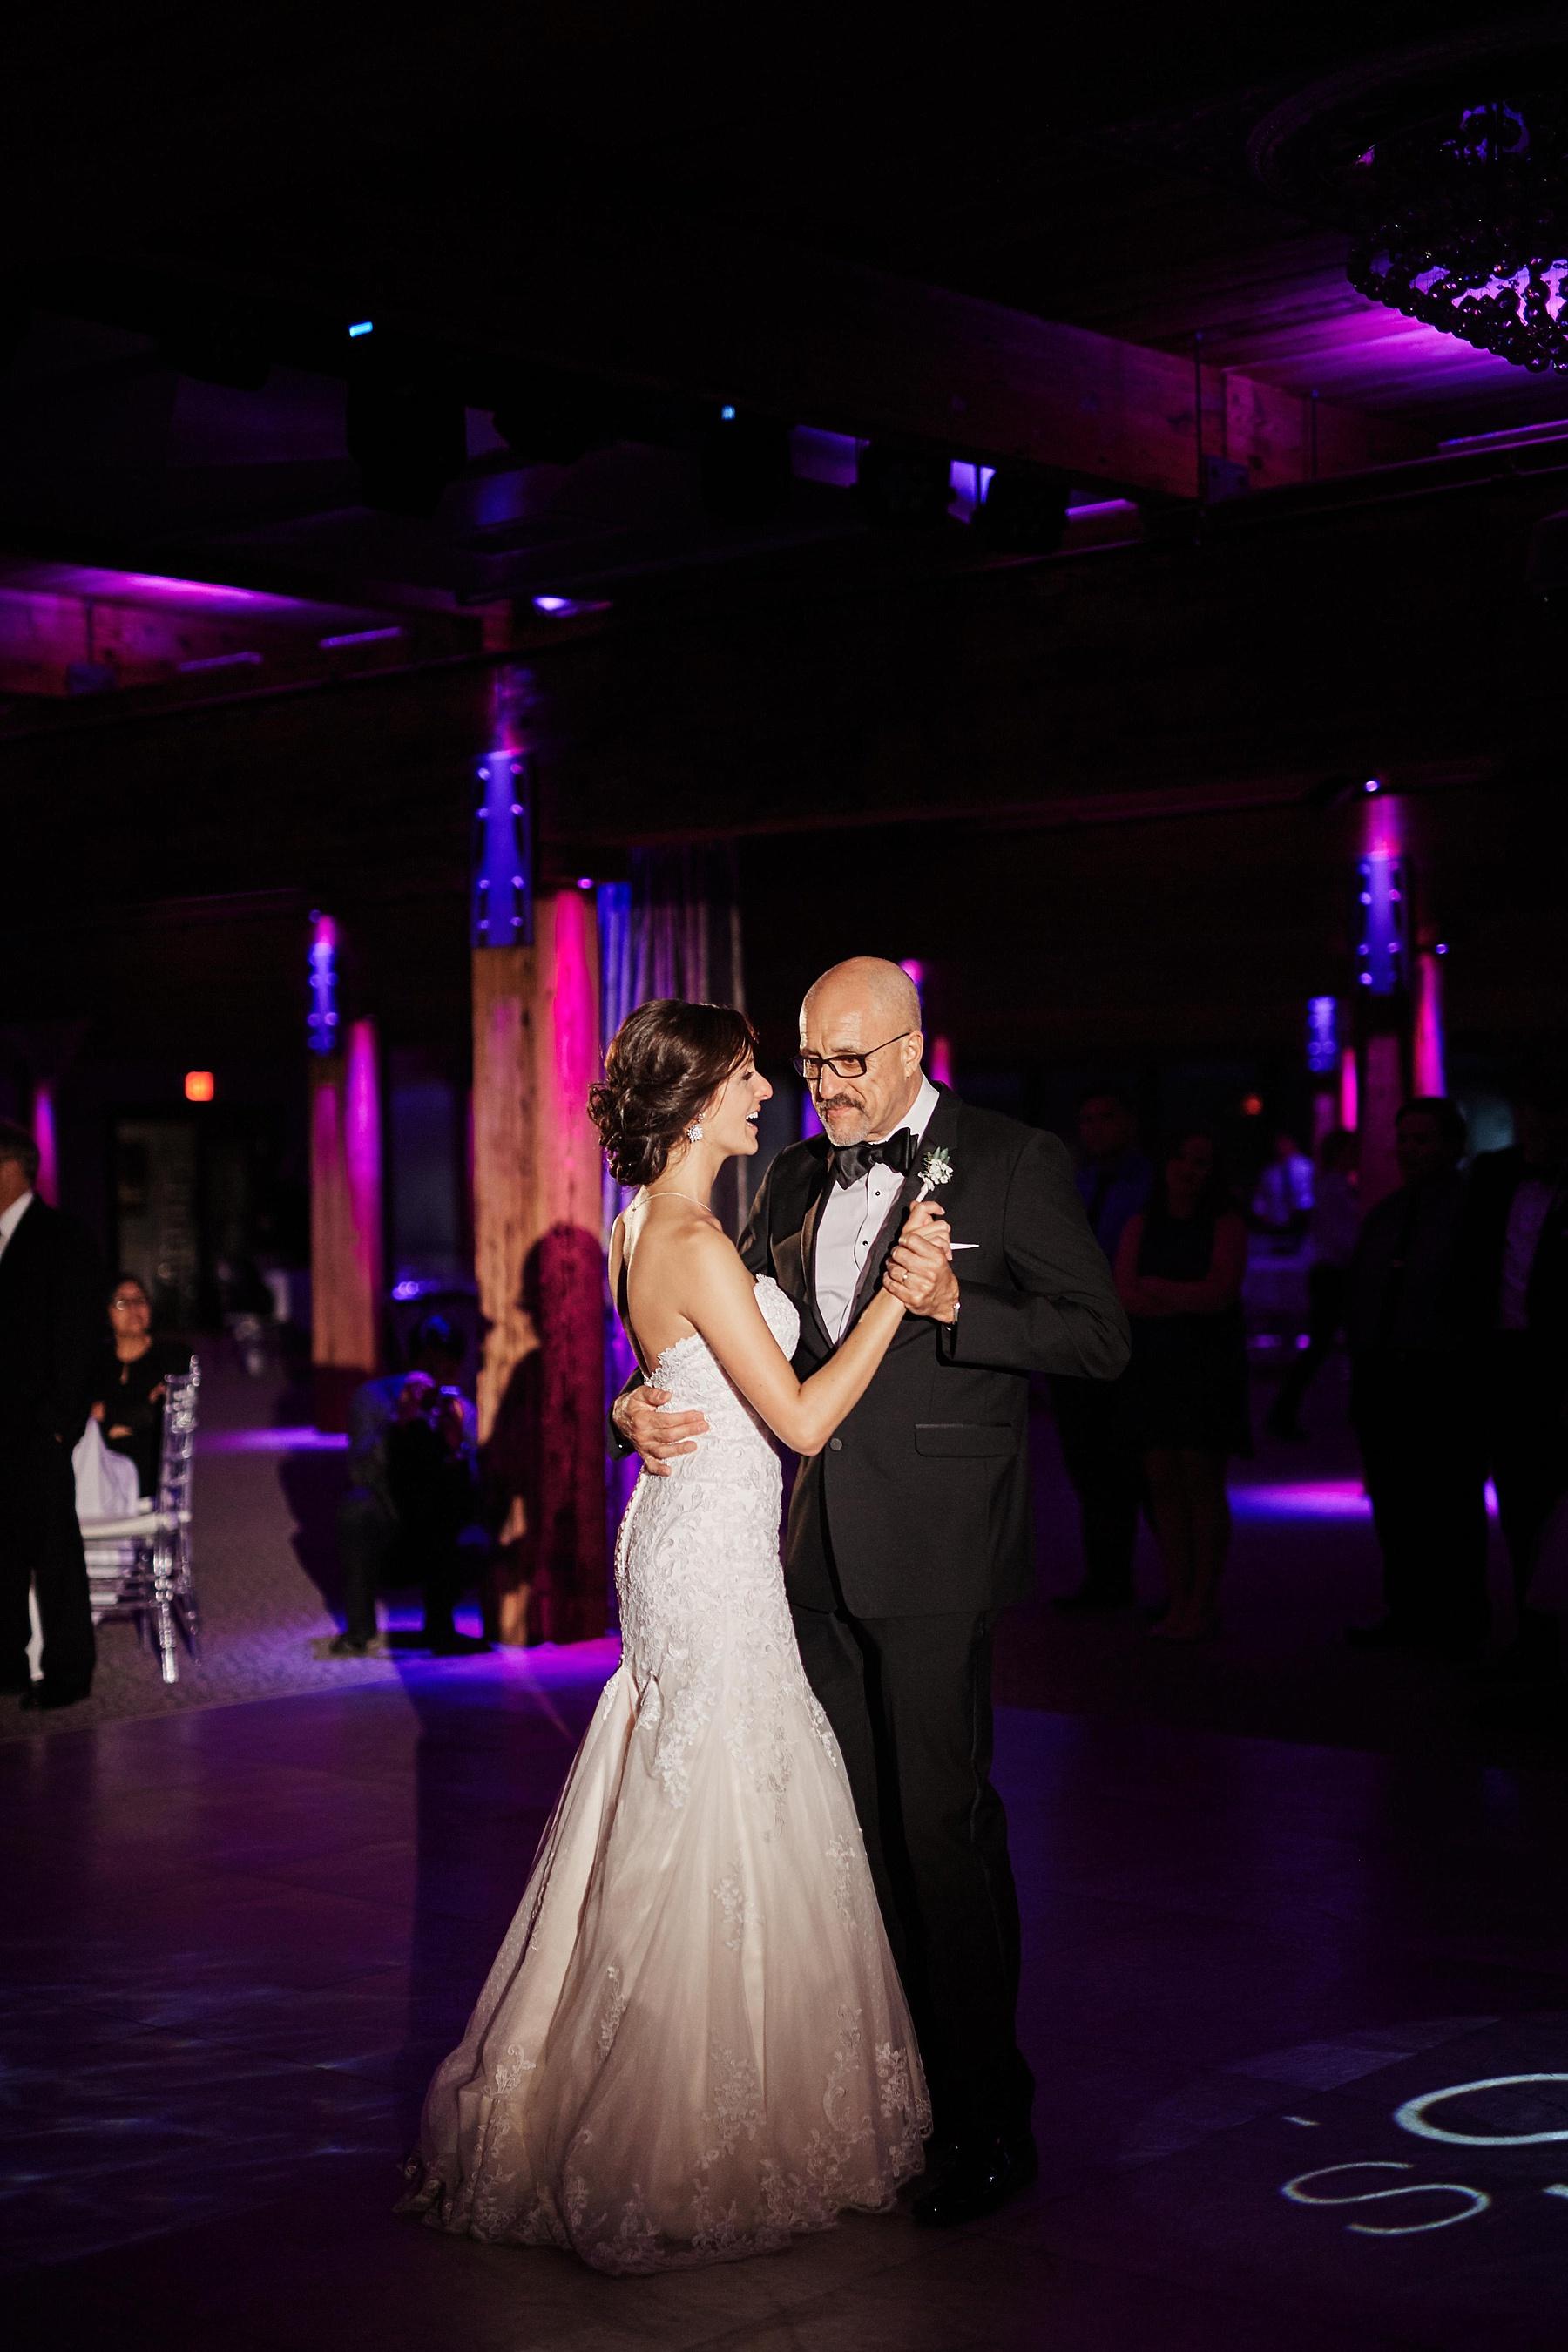 ABULAE-Wedding-Saint-paul-MN-Josh-Sofia-Wedding-Mears-Park_0849.jpg